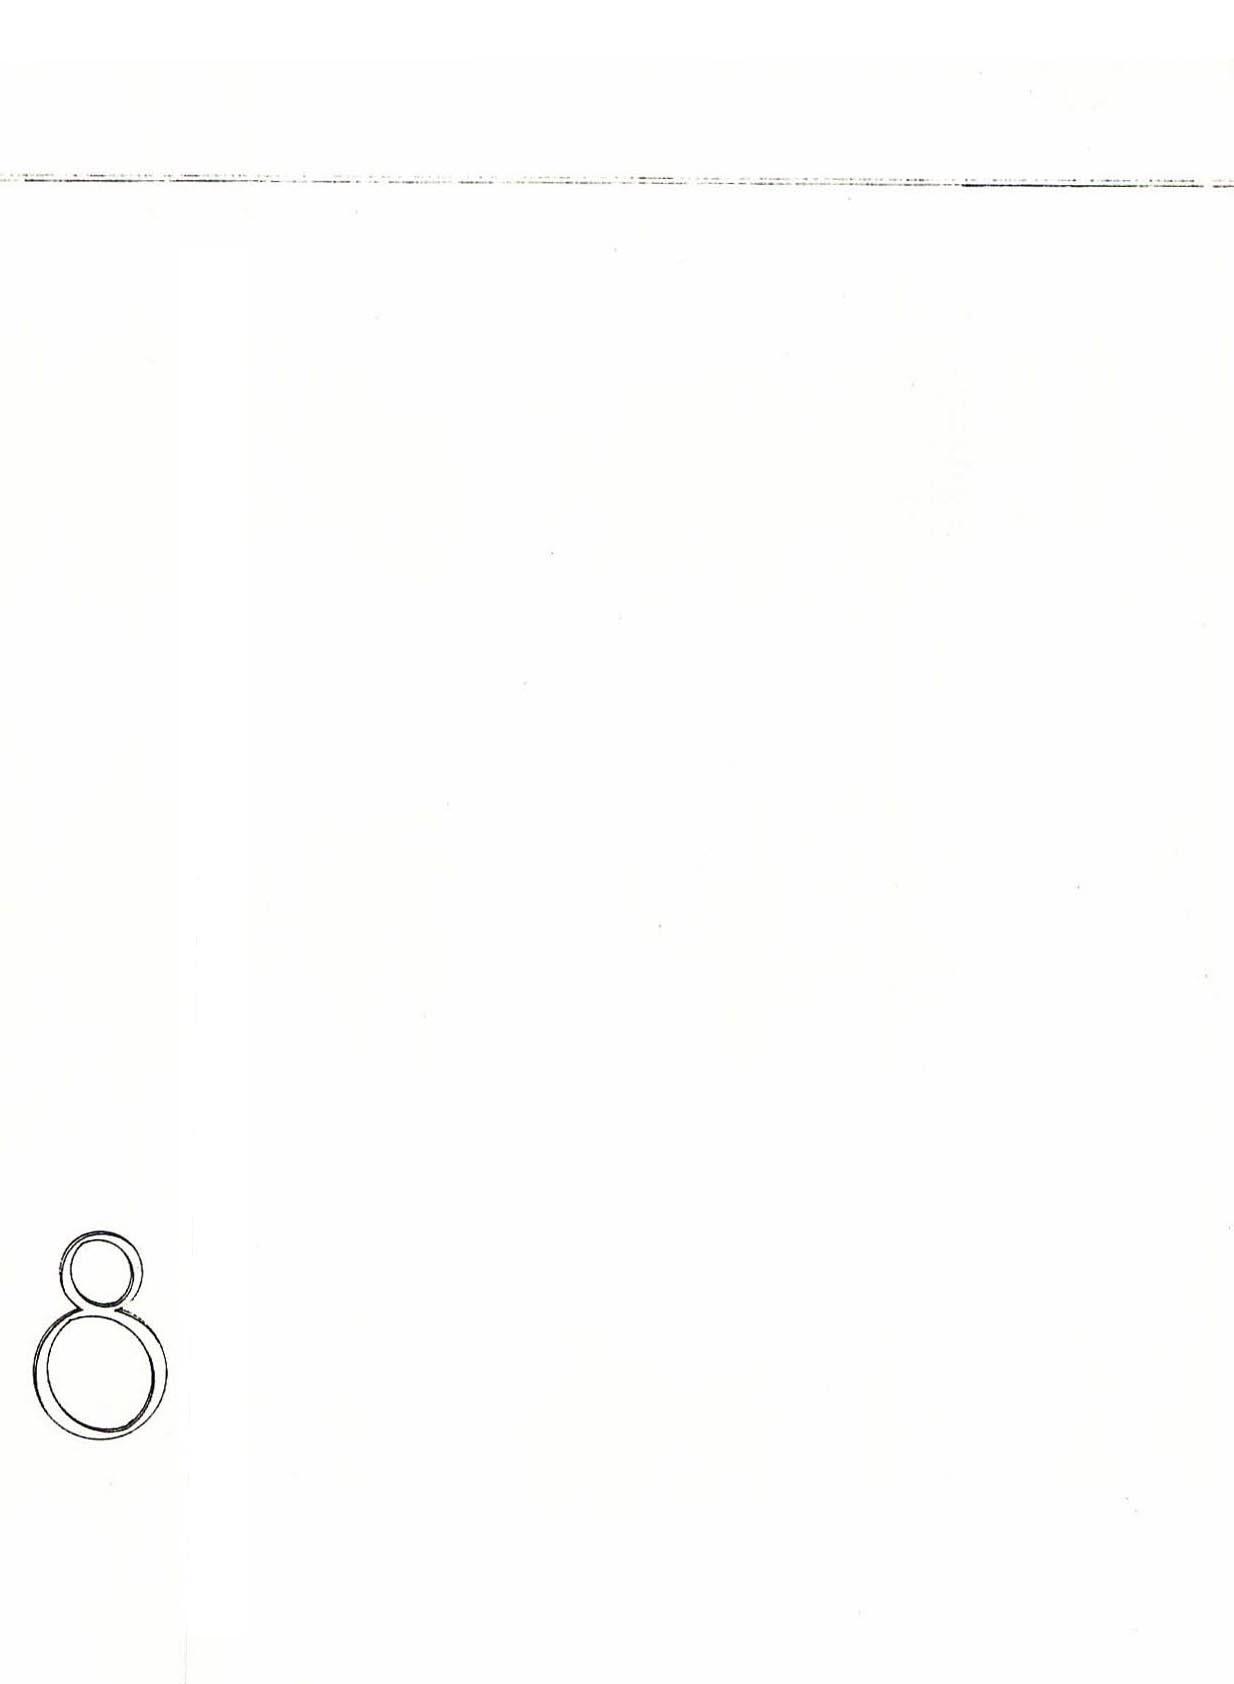 danielvillalobos-valladolid-blueprints-renaissance-a.9